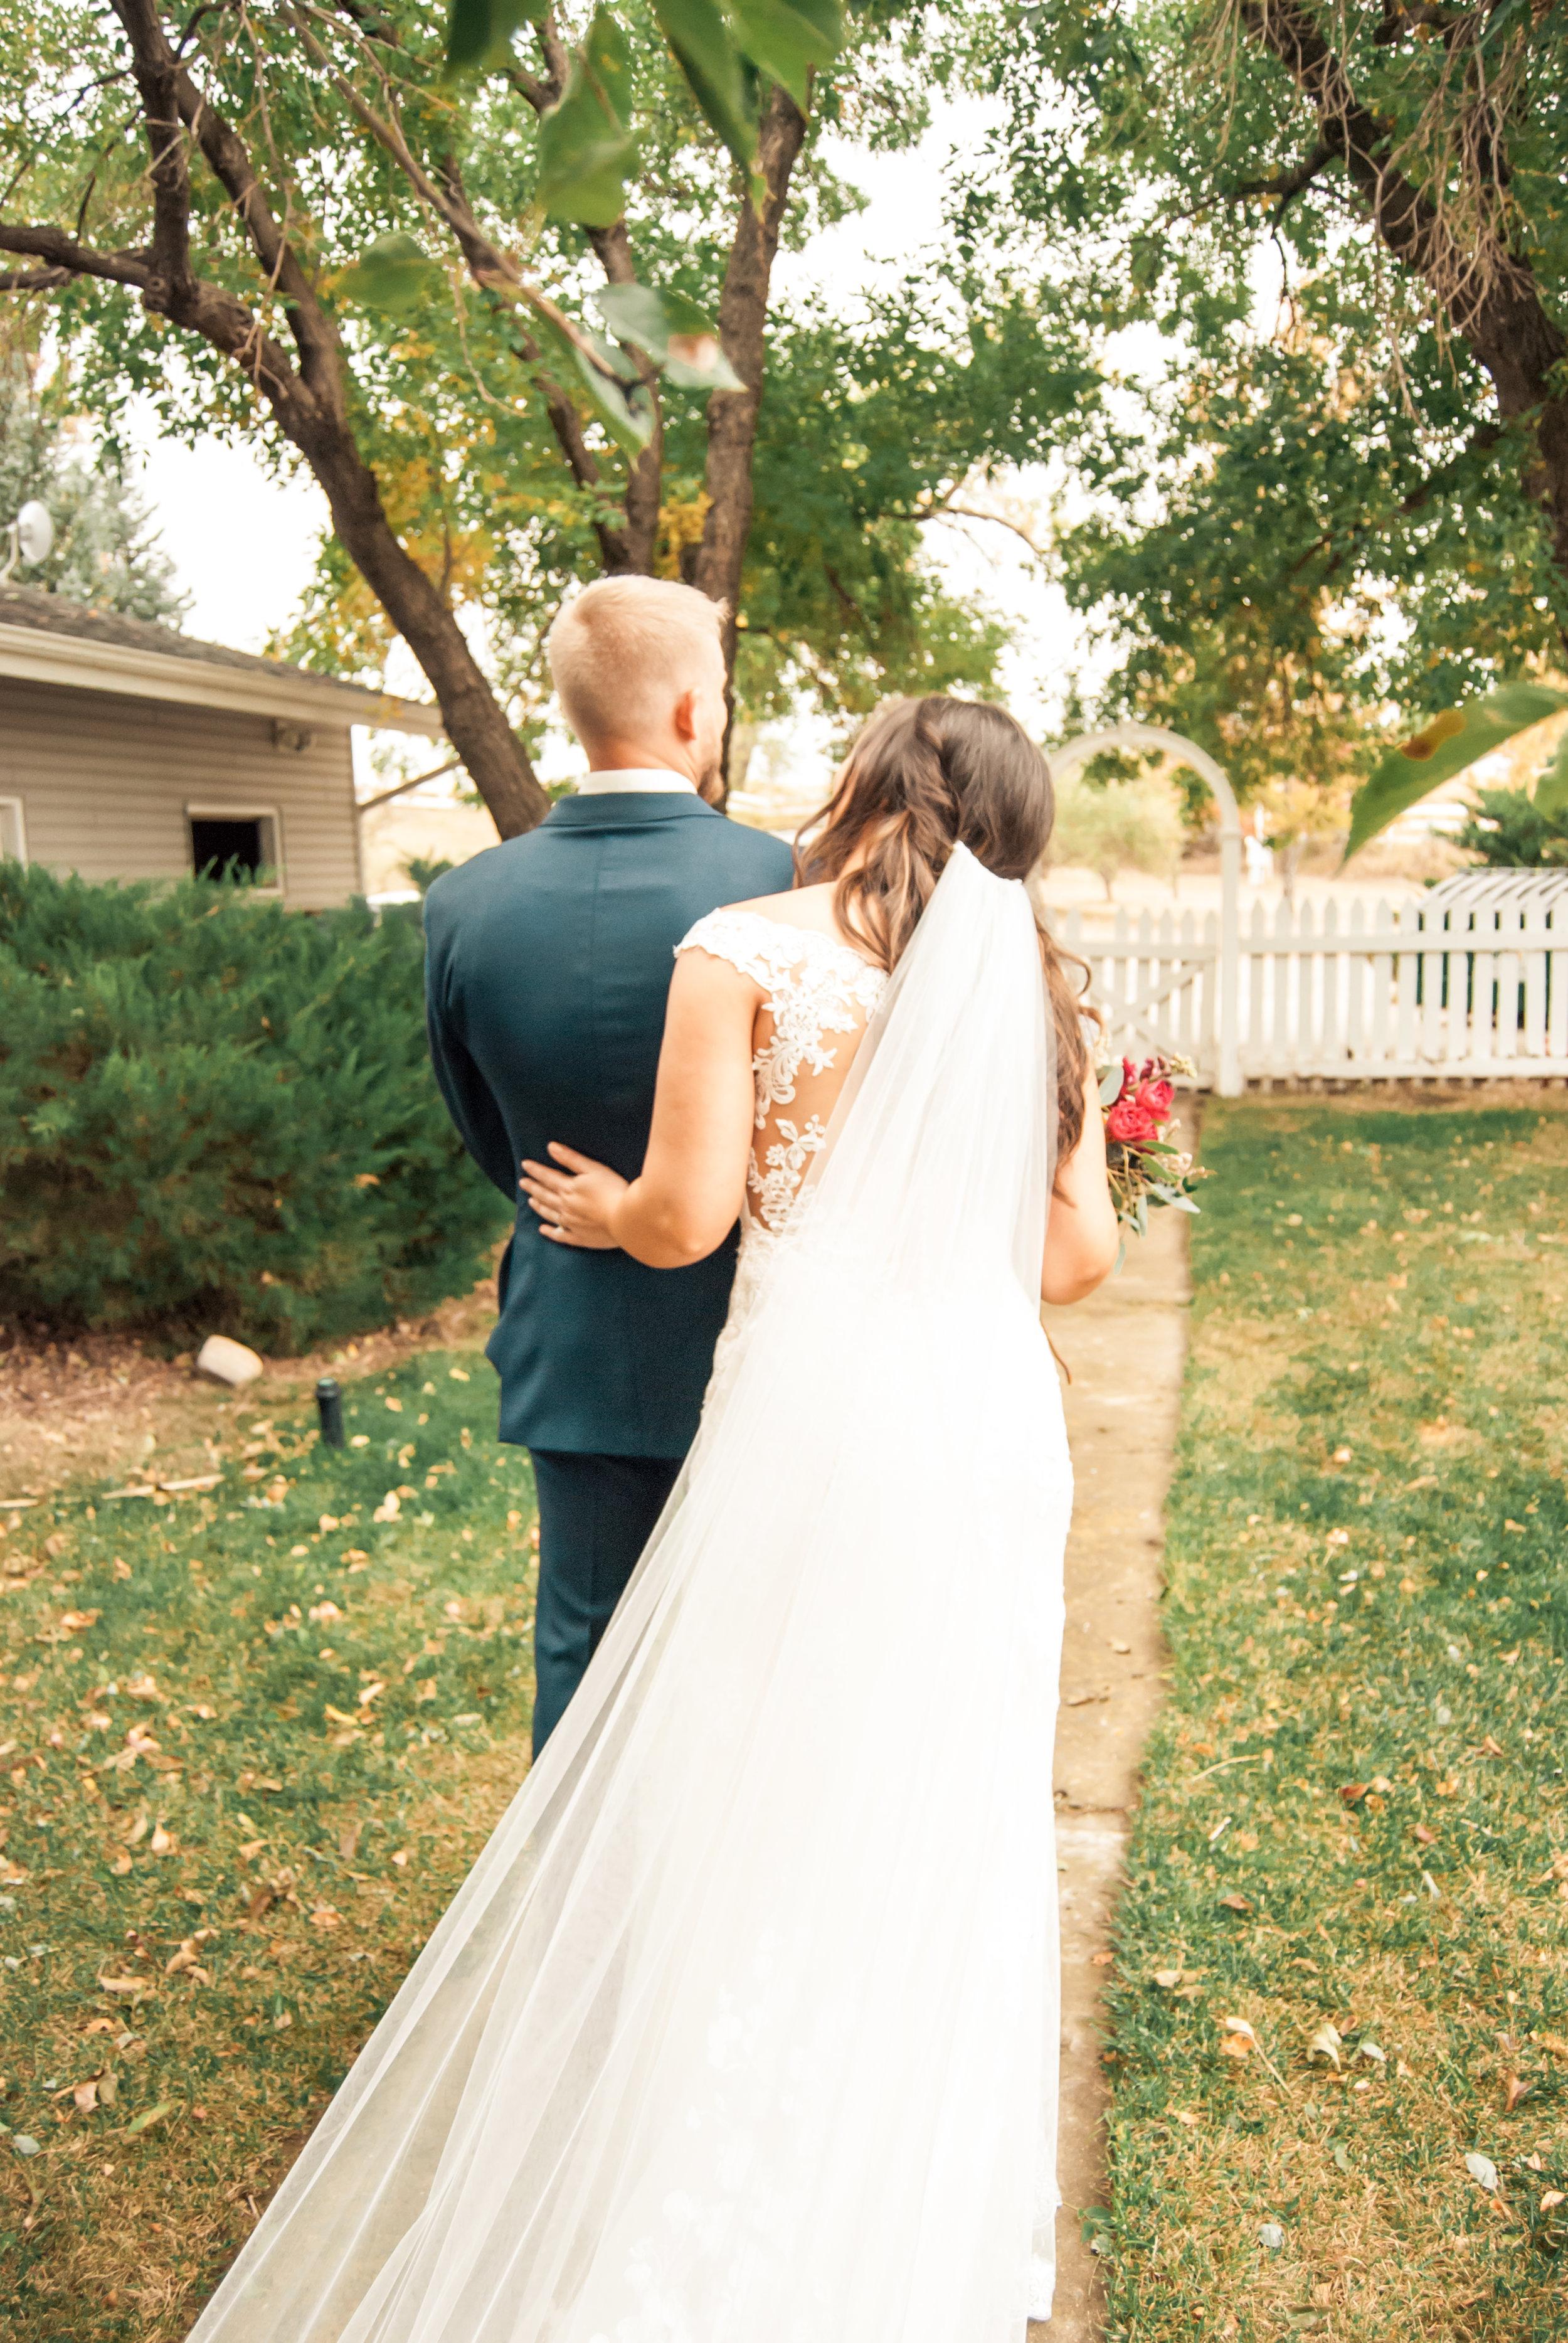 WeddingPortfolio-102.jpg